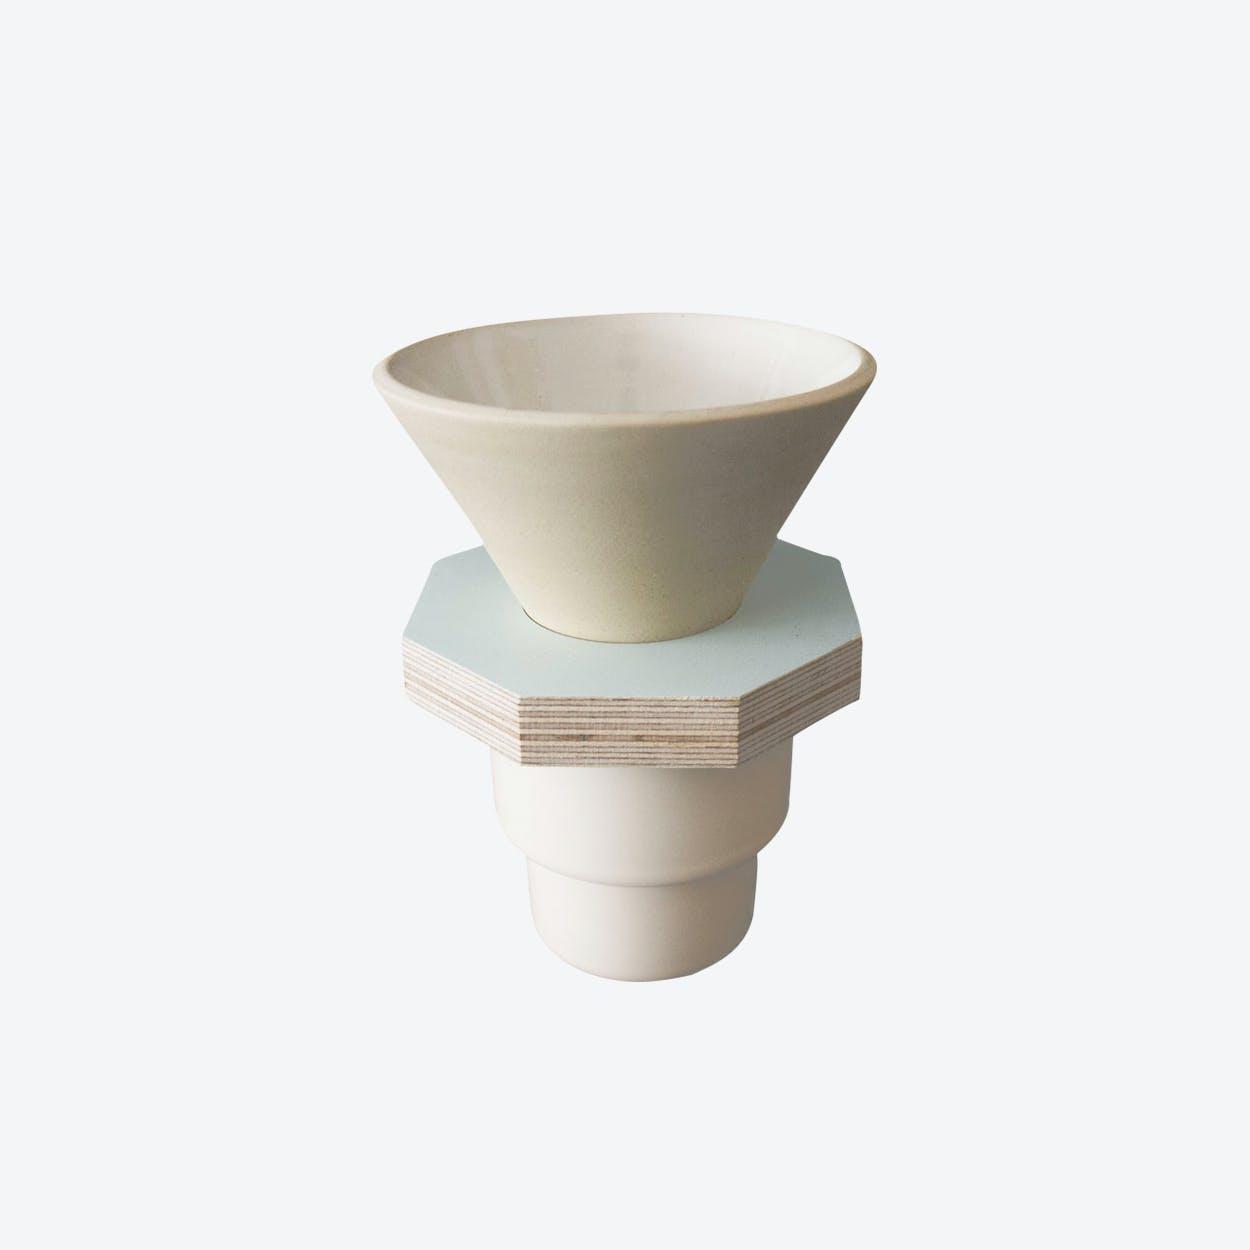 Ceramic Dripper in Beige and Lighr Blue Plywood